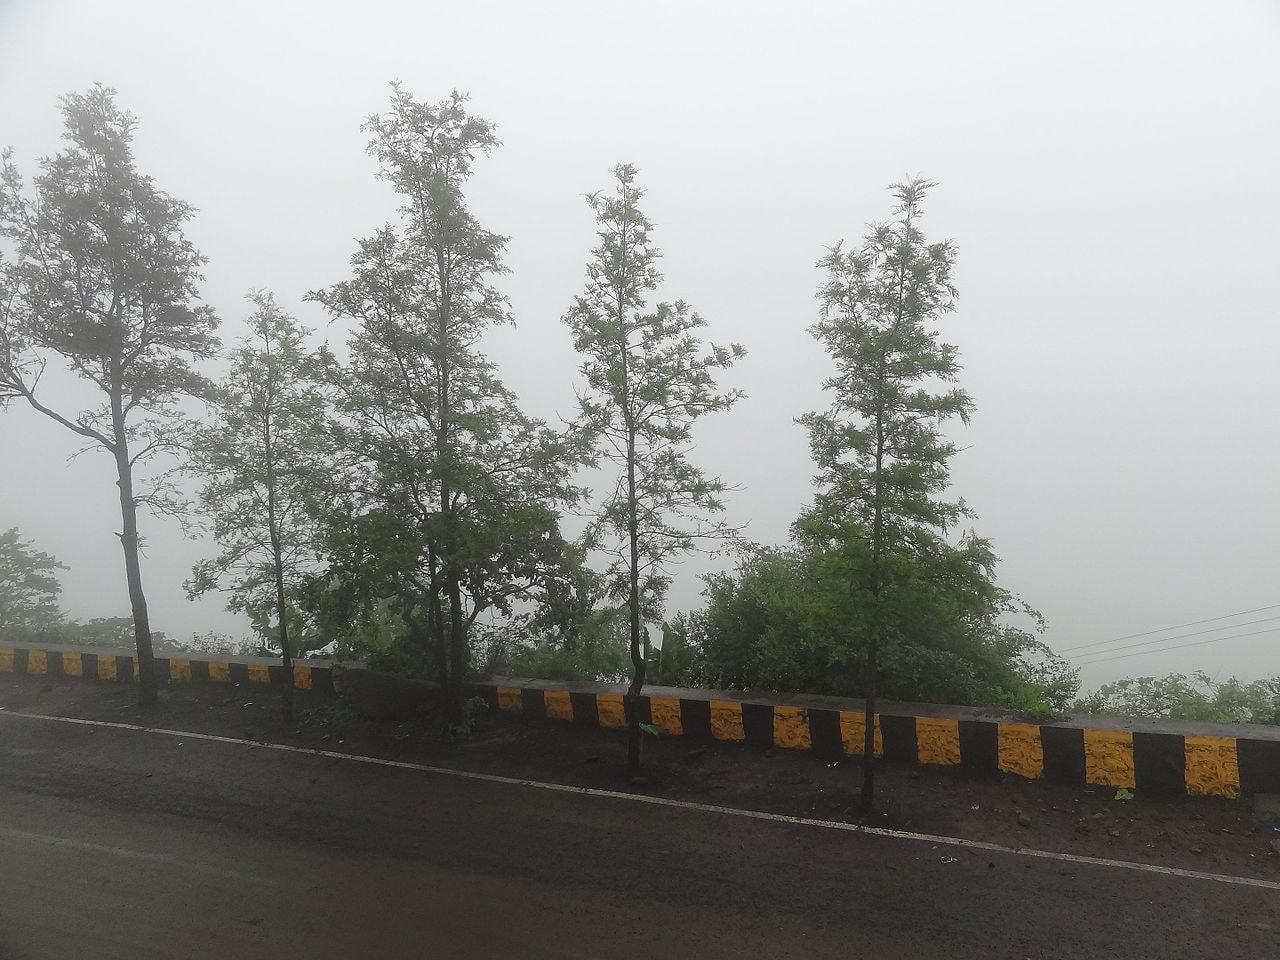 Sinhagad Road Ghat, Pune